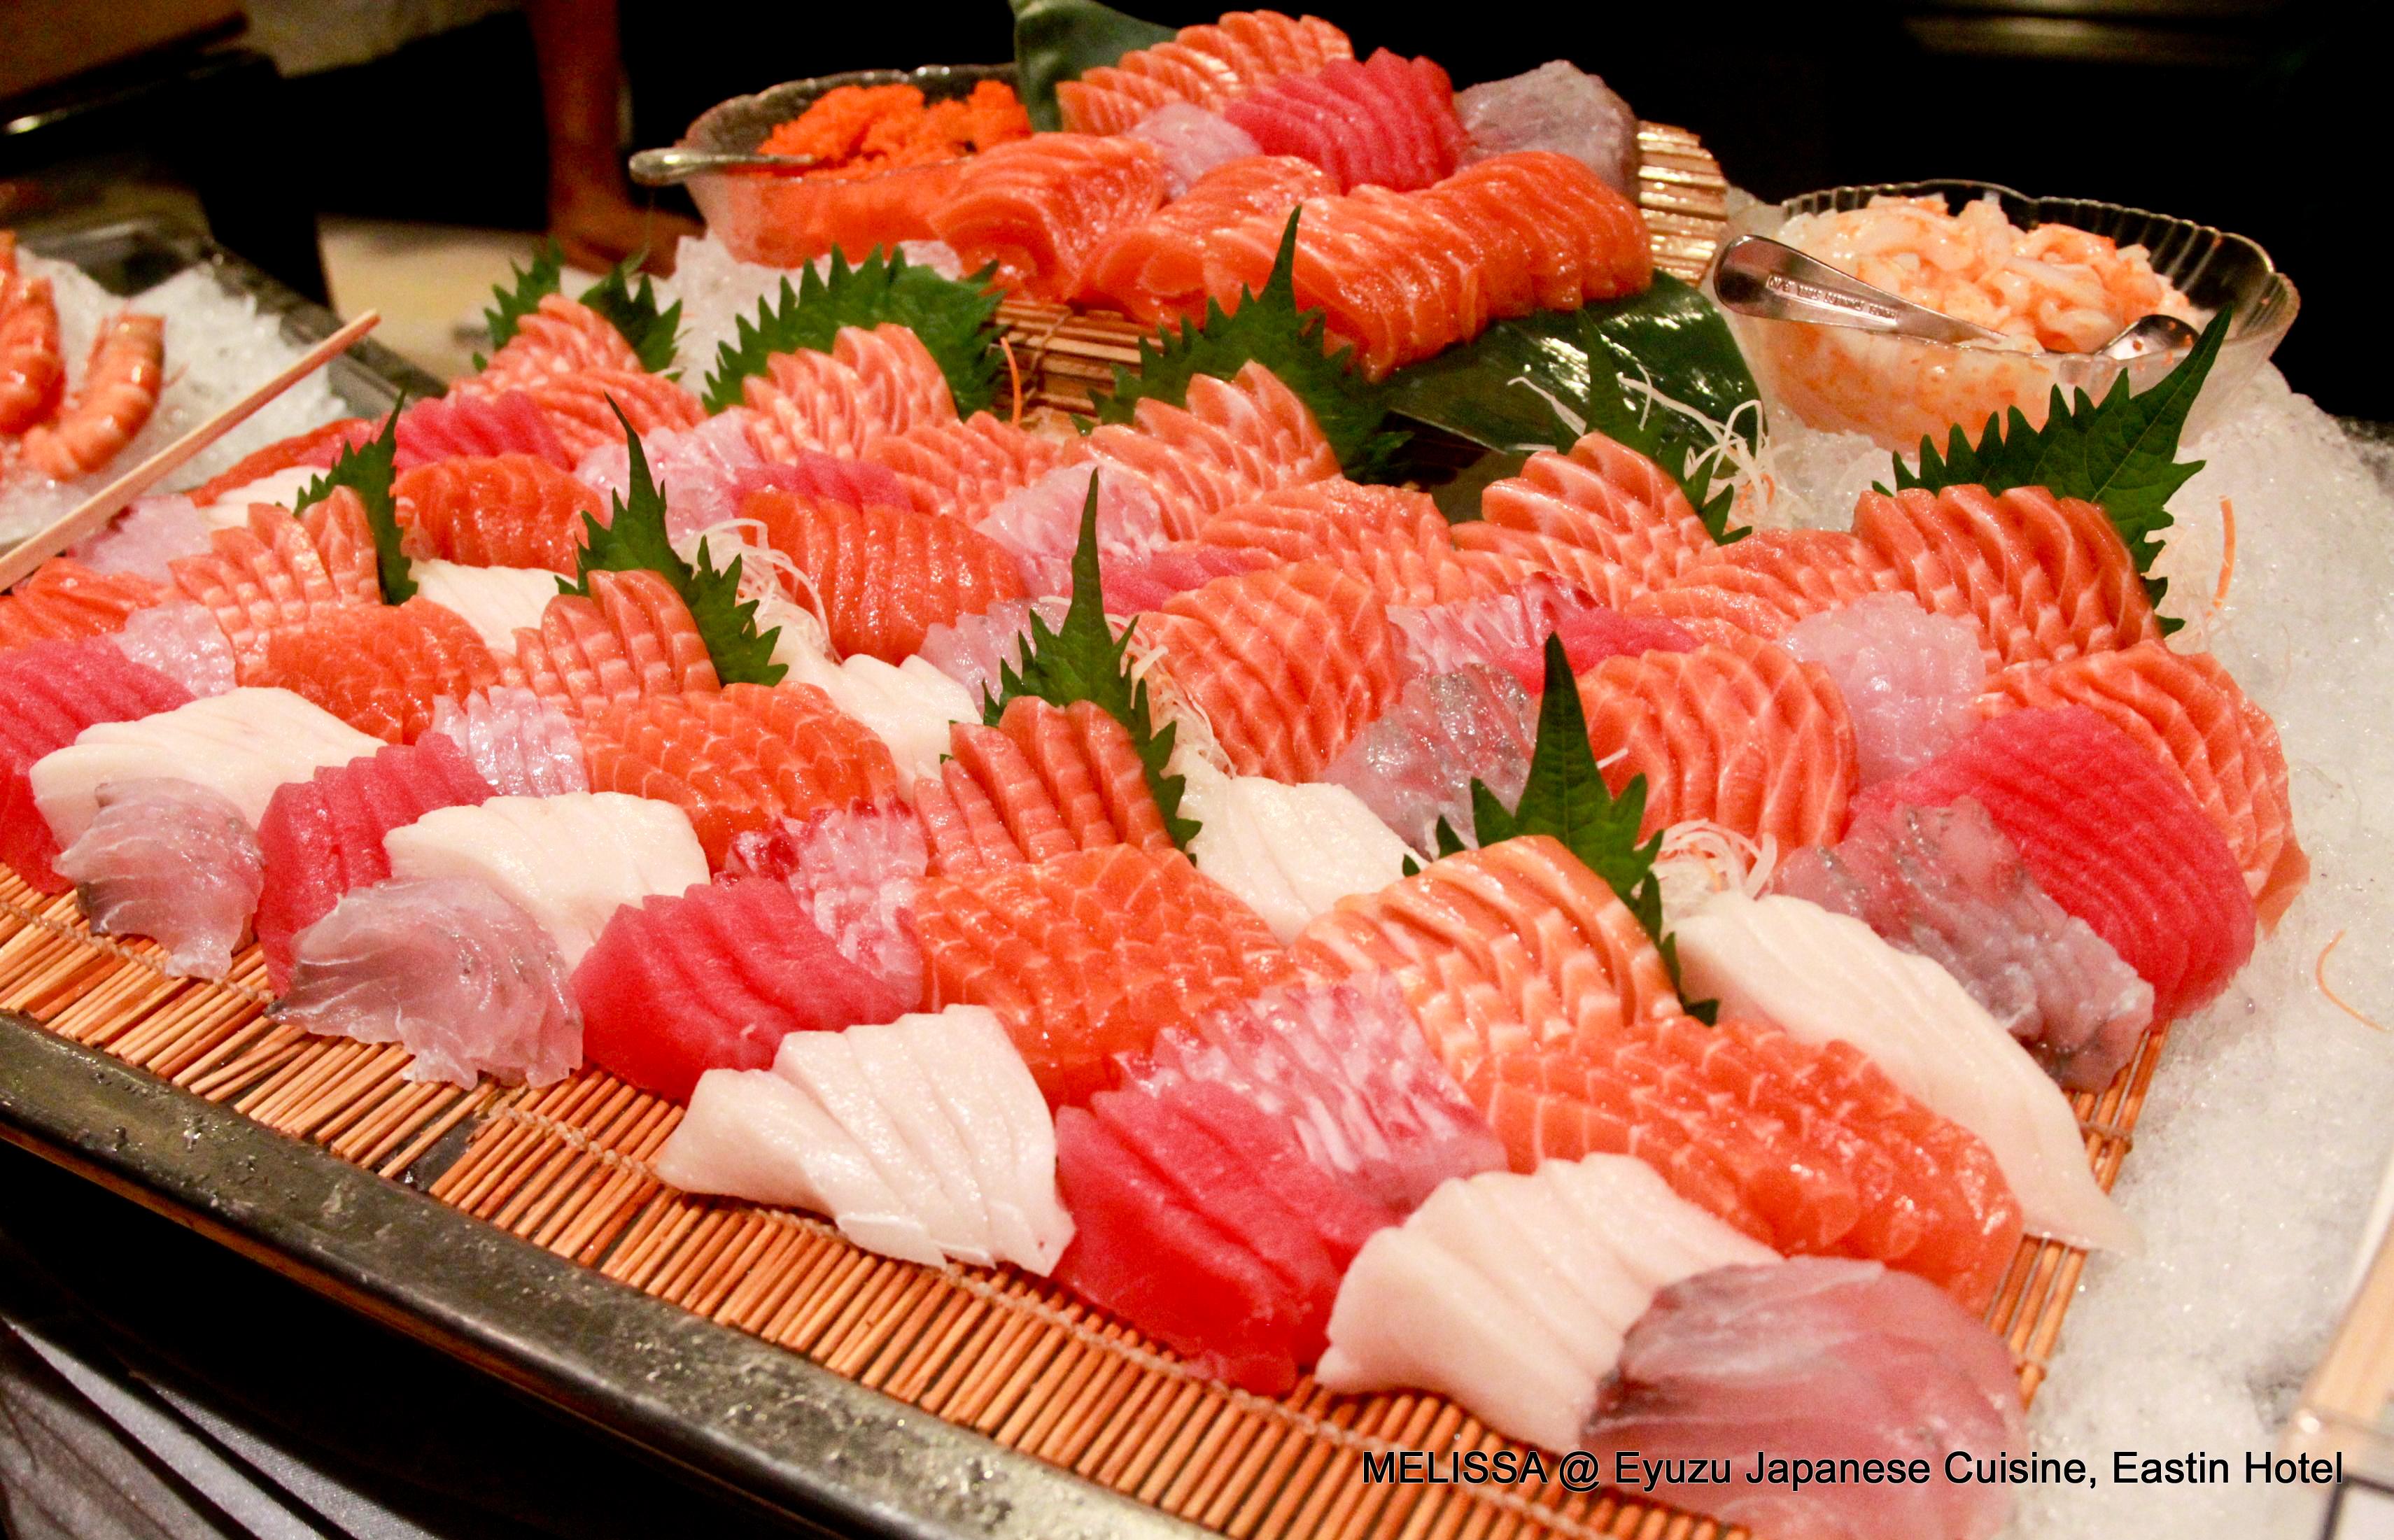 Buffet dinner eyuzu japanese cuisine eastin hotel for Best sashimi fish